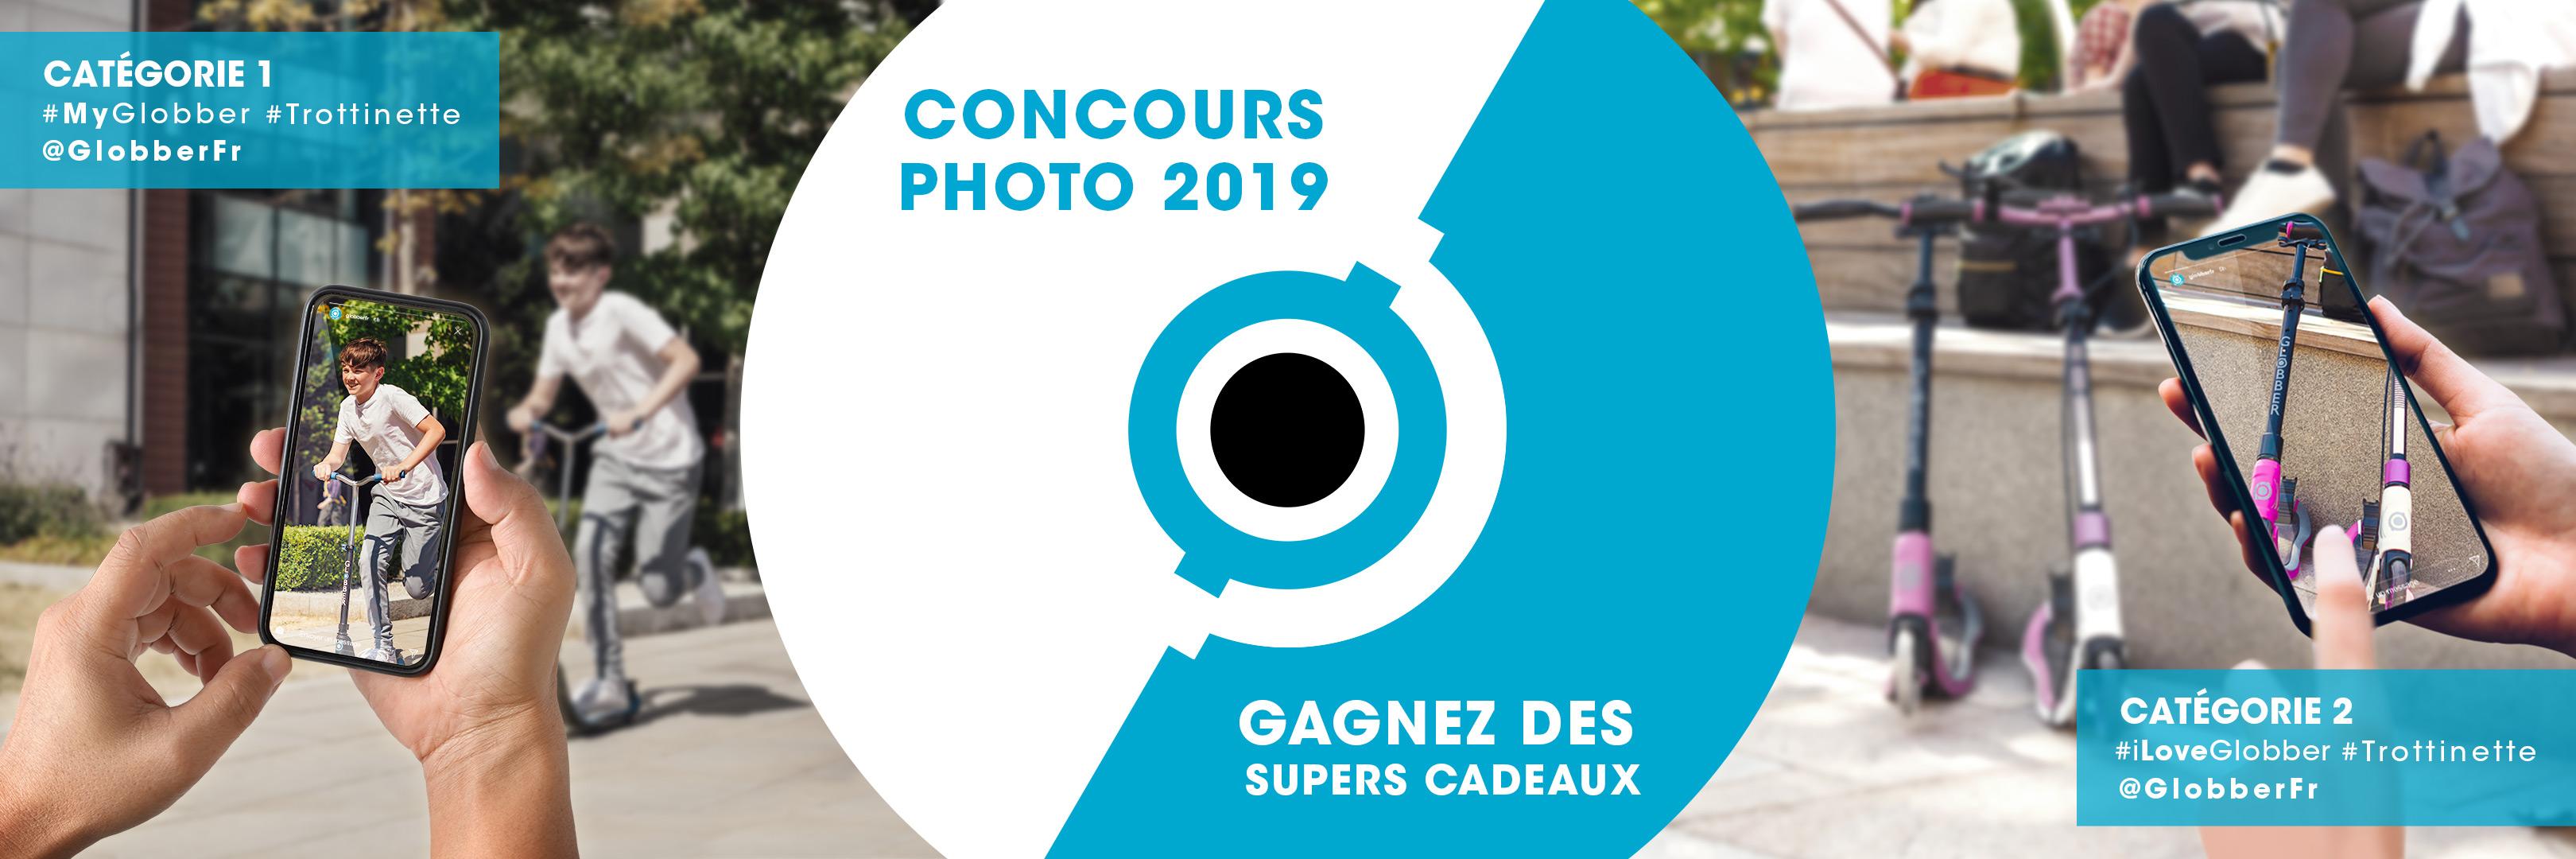 CONCOURS-PHOTO-2019